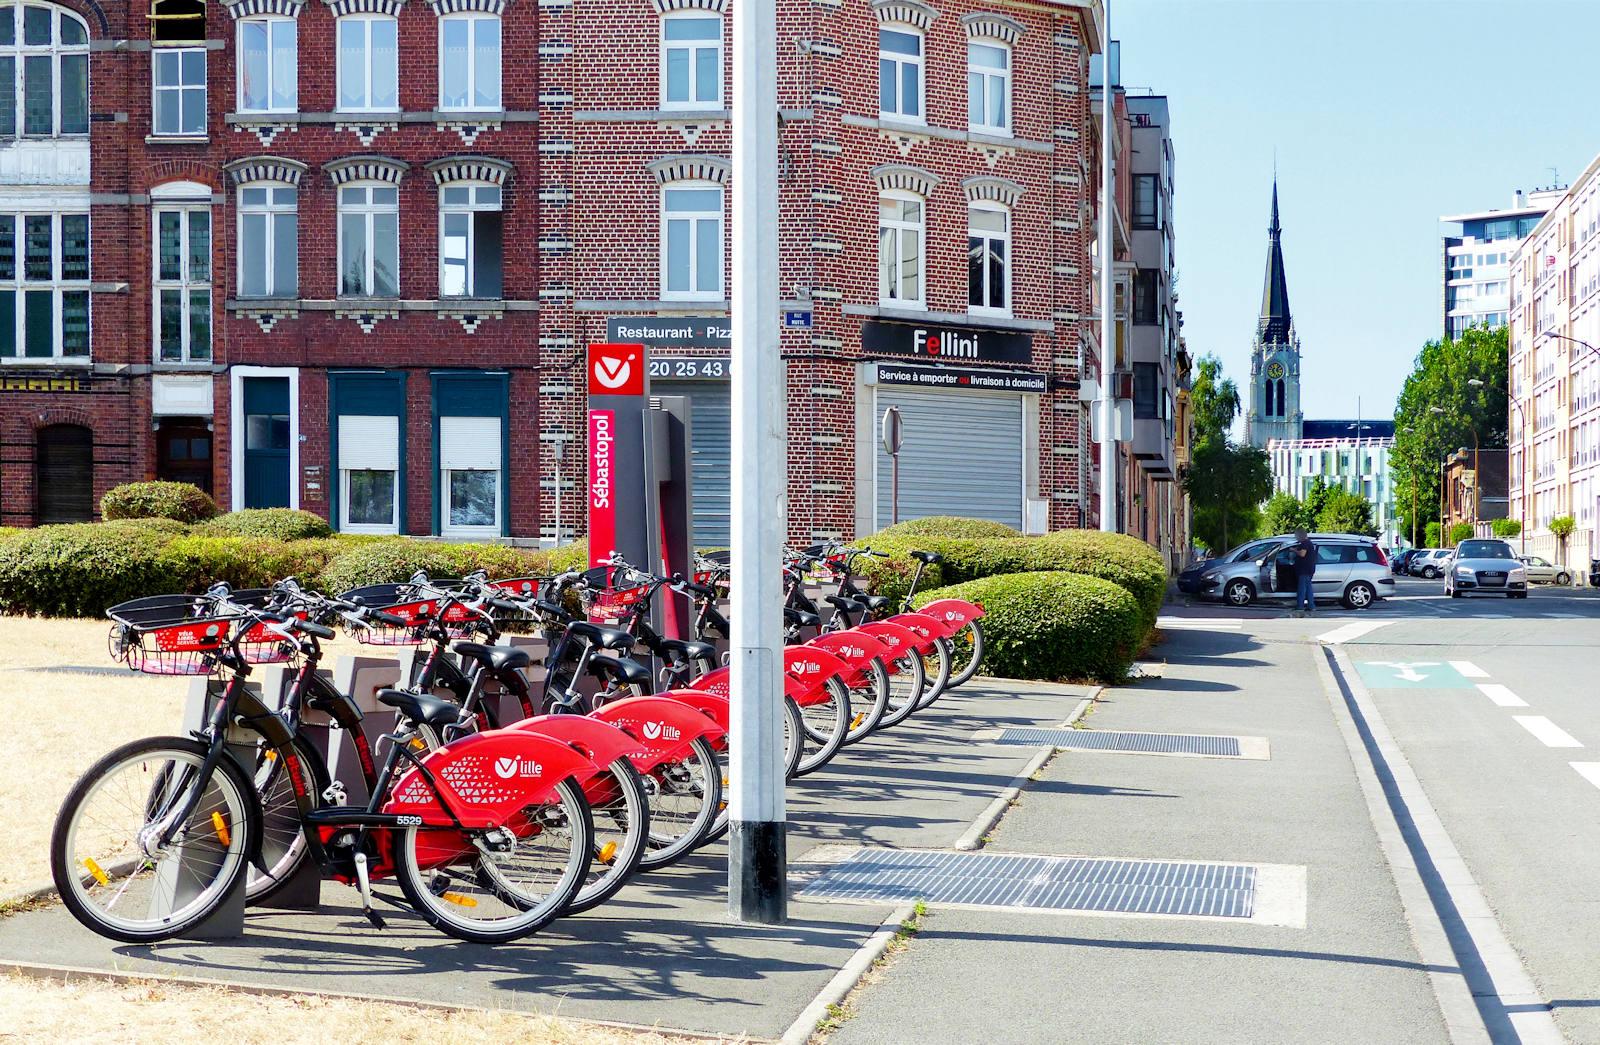 Sébastopol V'Lille location vélos - Tourcoing, rue carnot